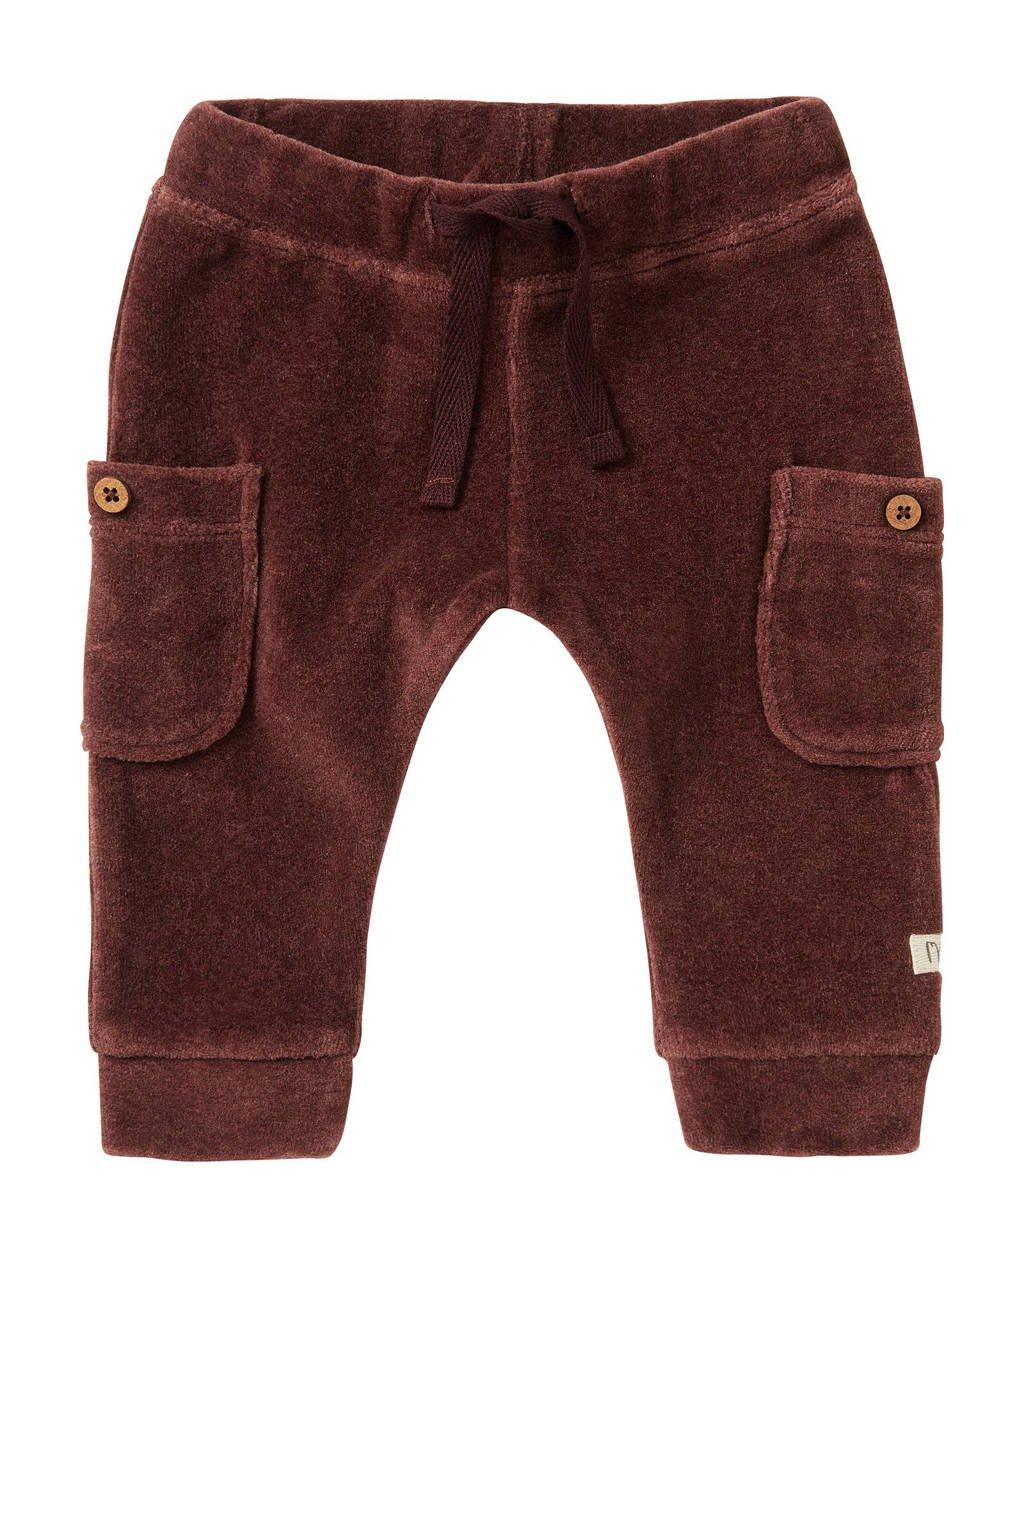 Noppies baby regular fit broek Iswepe bruin, Bruin